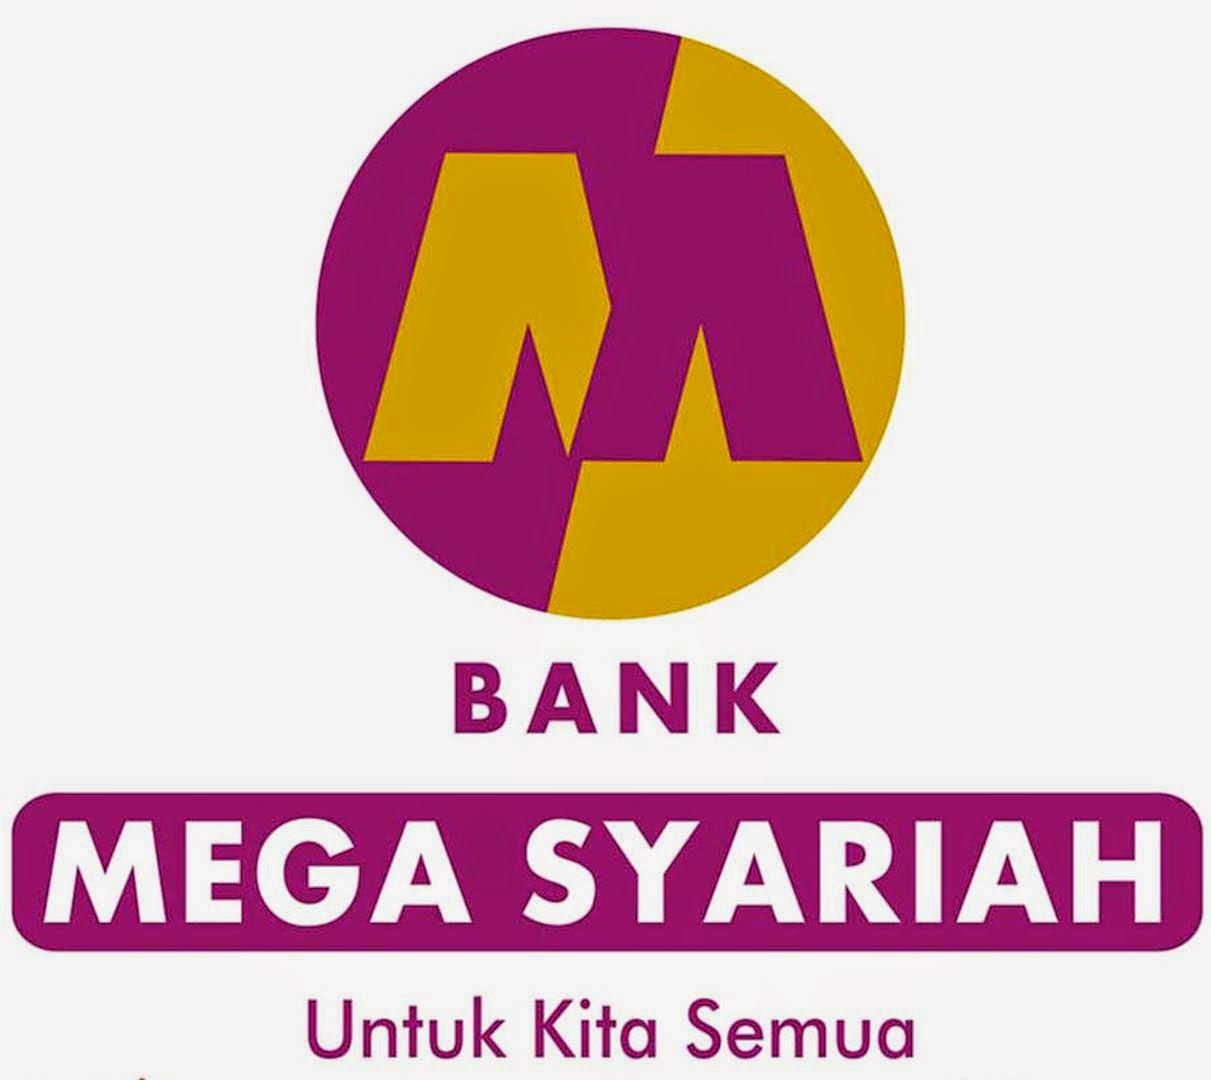 Lowongan Kerja Bank Mega Syariah Terbaru November 2014